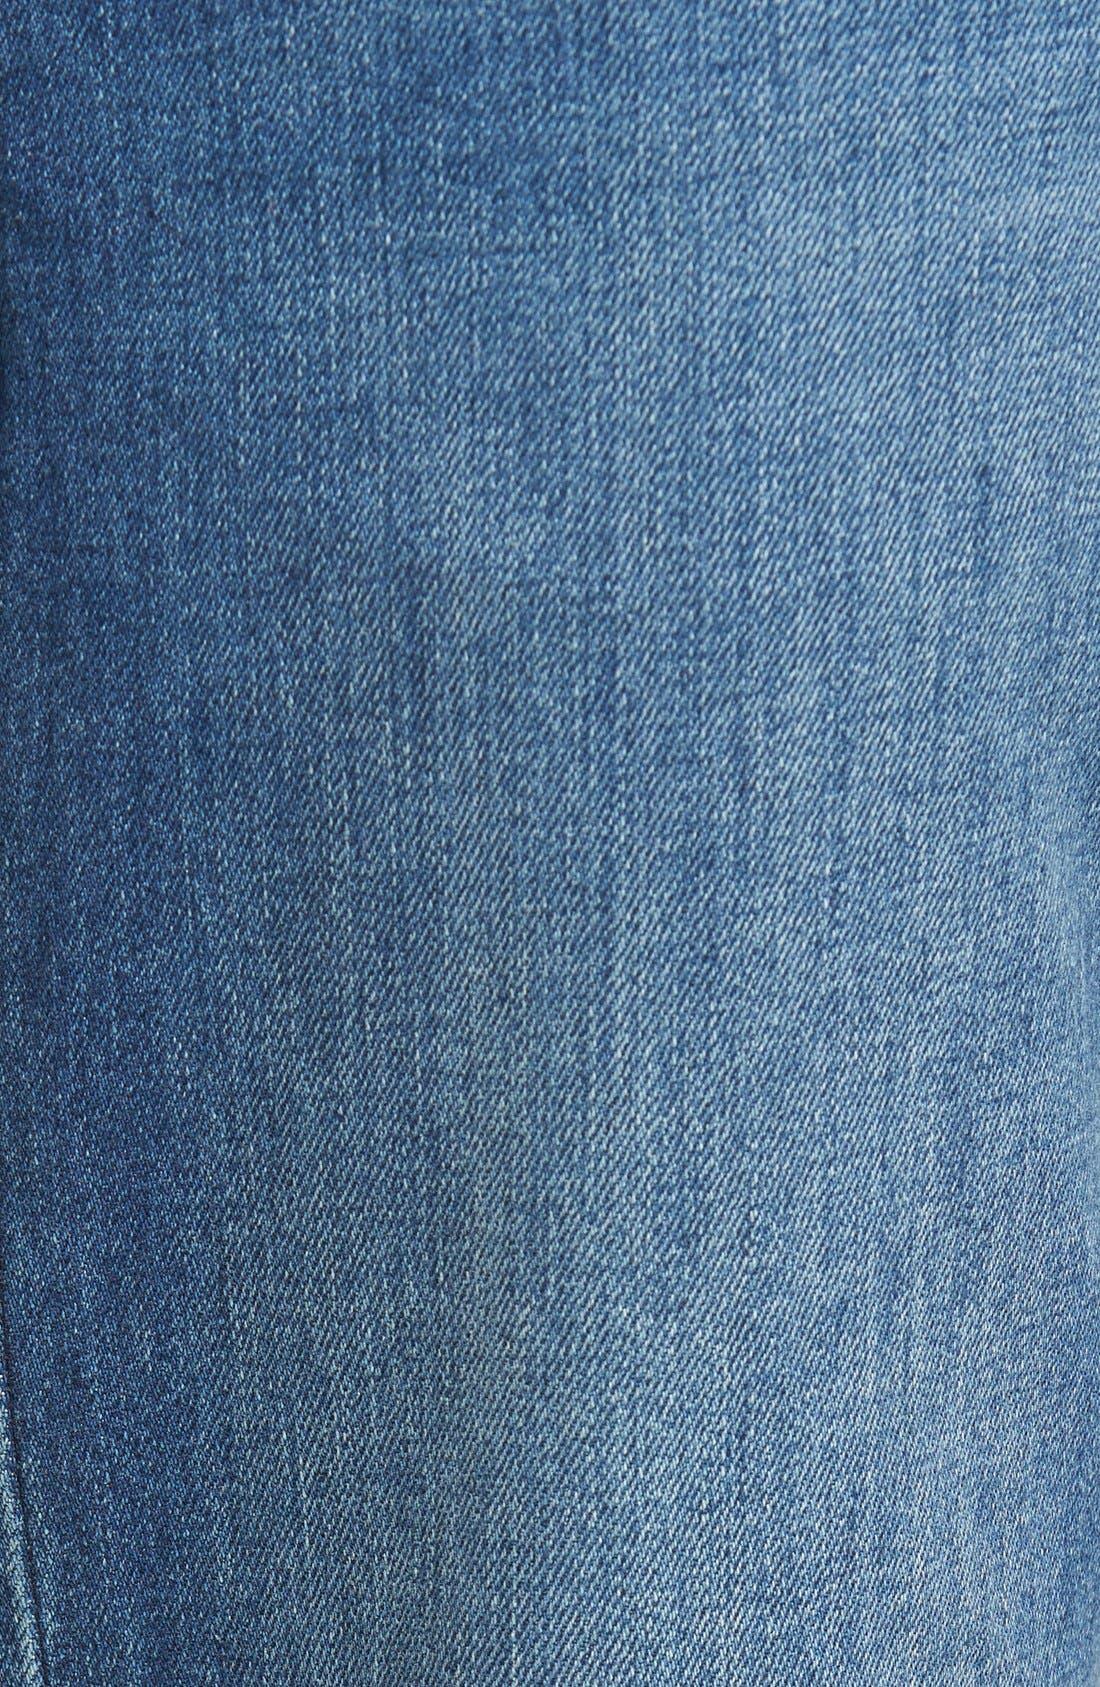 'Nicholls' Regular Fit Straight Leg Jeans,                             Alternate thumbnail 4, color,                             DENIM